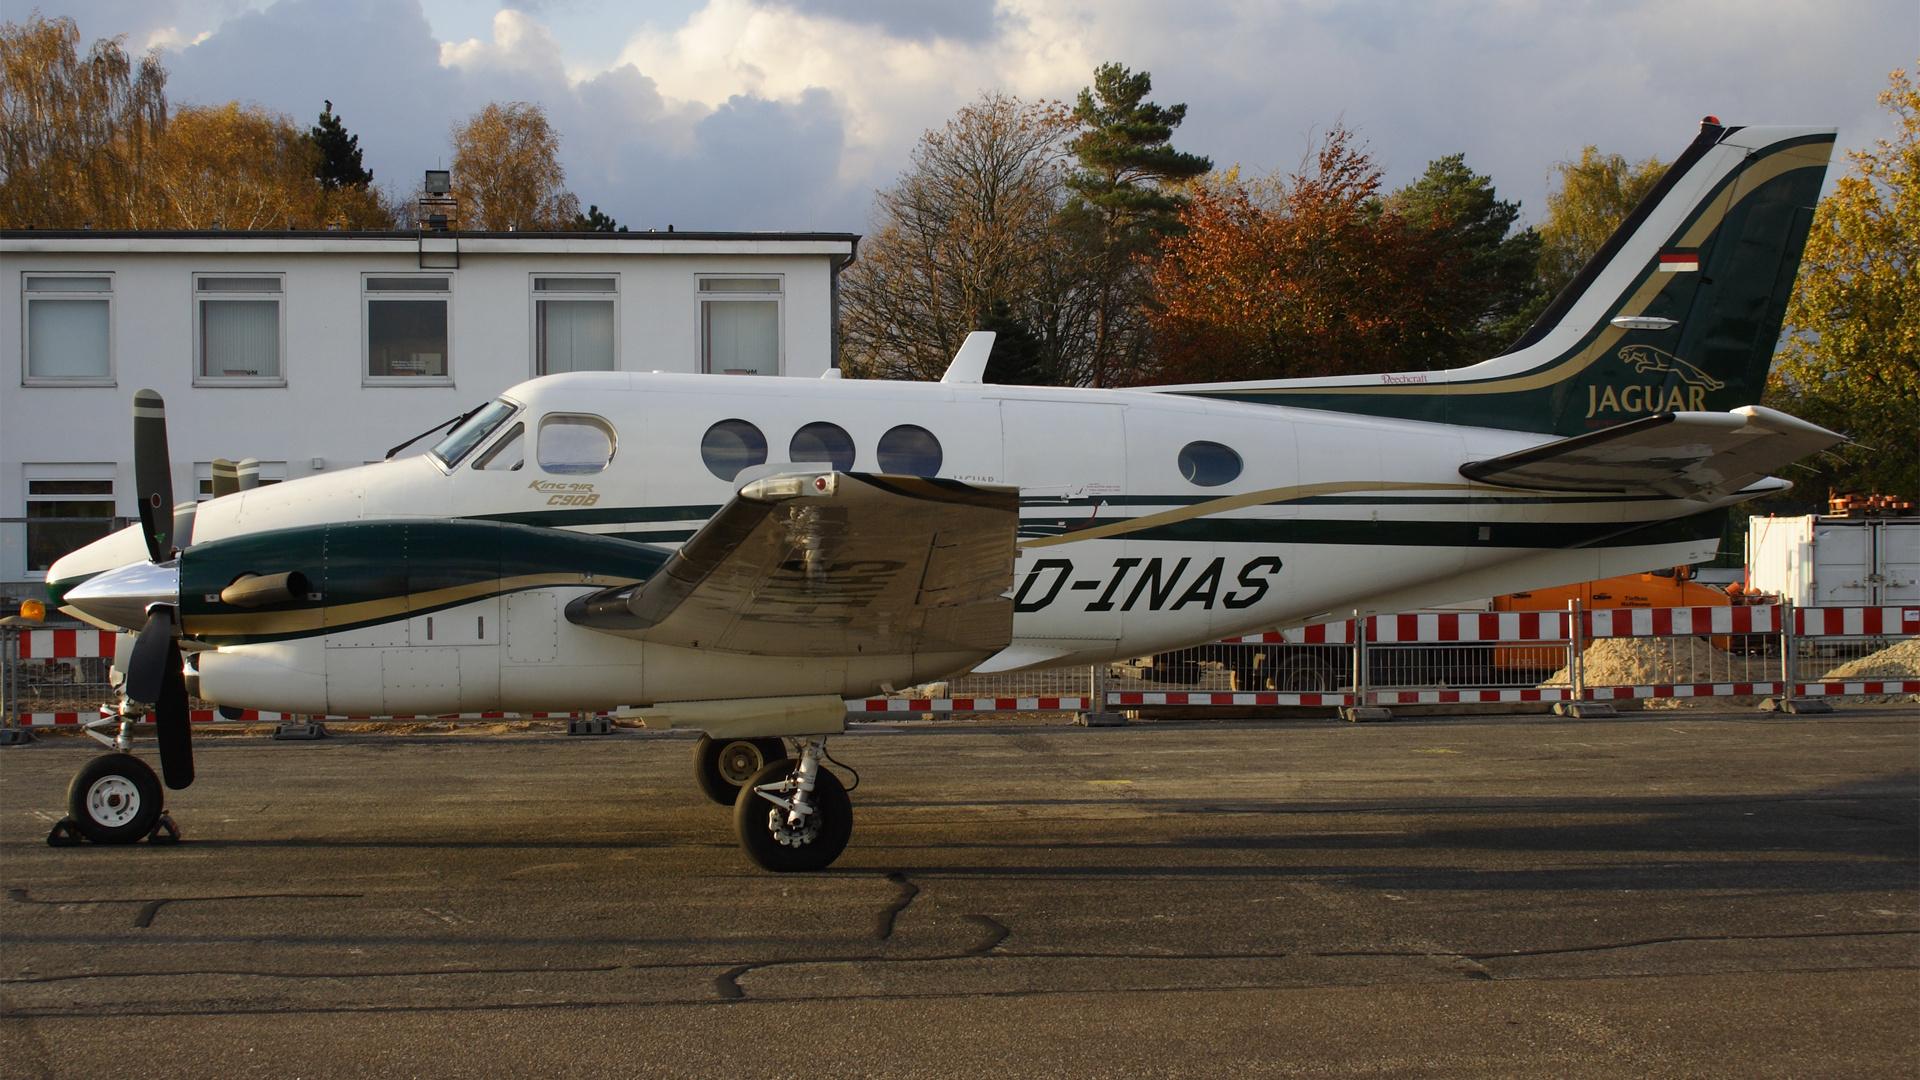 D-INAS-1 B90 ESS 200810